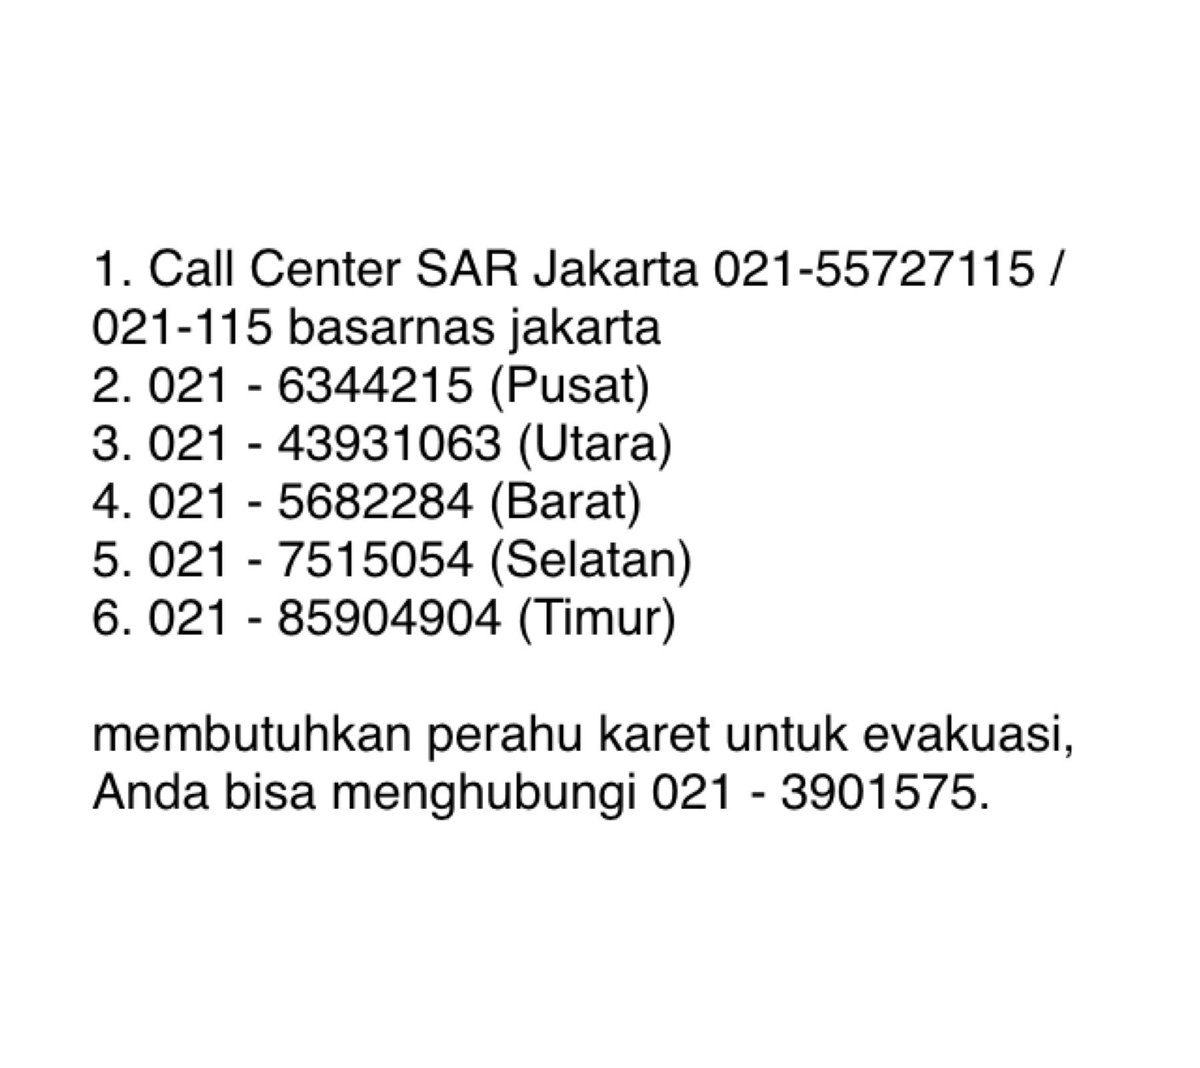 #telponpenting #emergency #BanjirJakarta #Jabodetabek  #jakarta #banjir2020 #callcenter https://t.co/mHxotOSHed